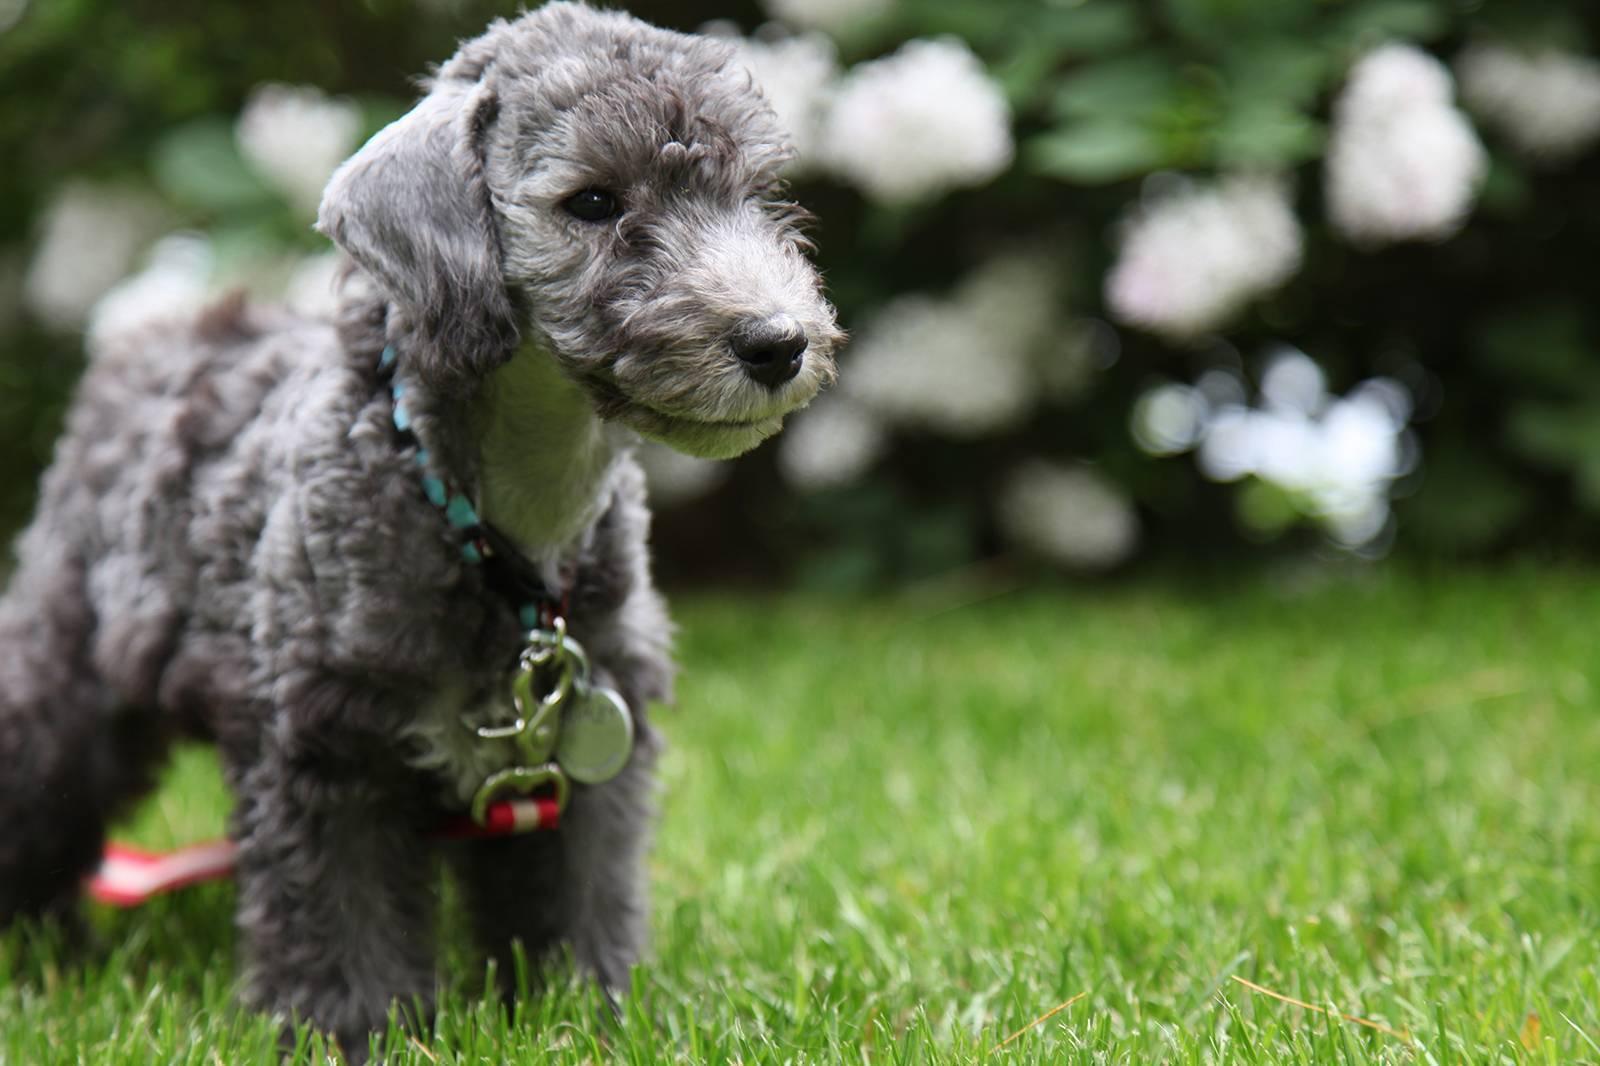 Бедлингтон терьер - все о терьерах, порода собак, стандарт и классификация